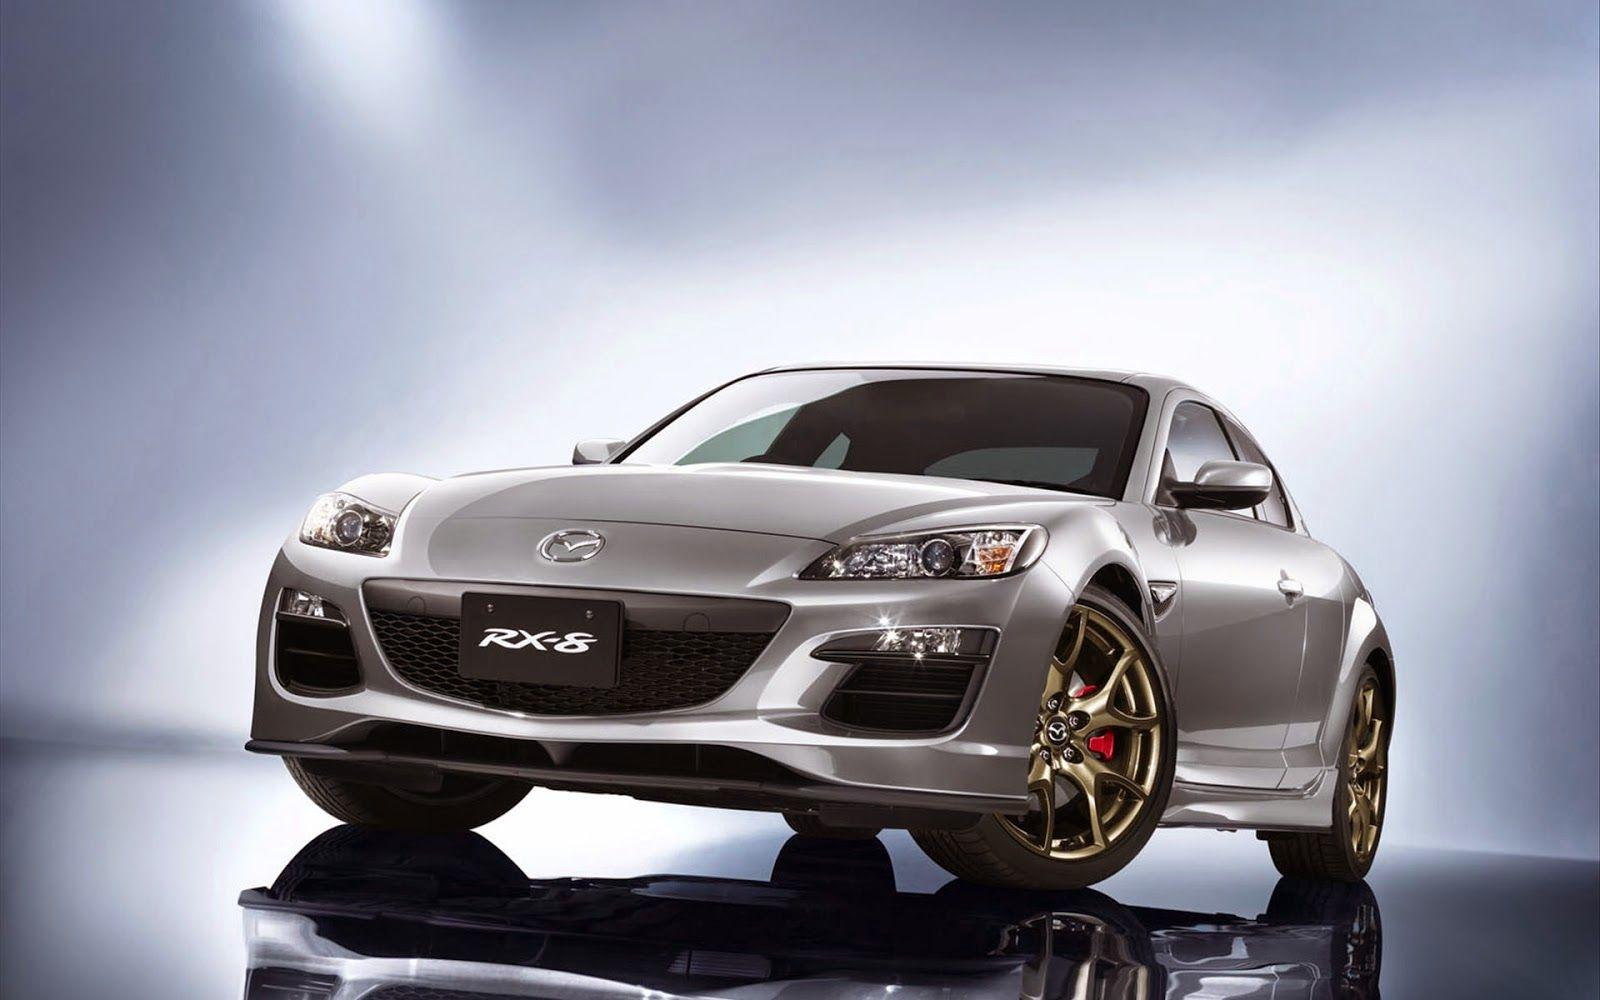 2012 Mazda RX SPIRIT R Free Wallpaper Auto Cars